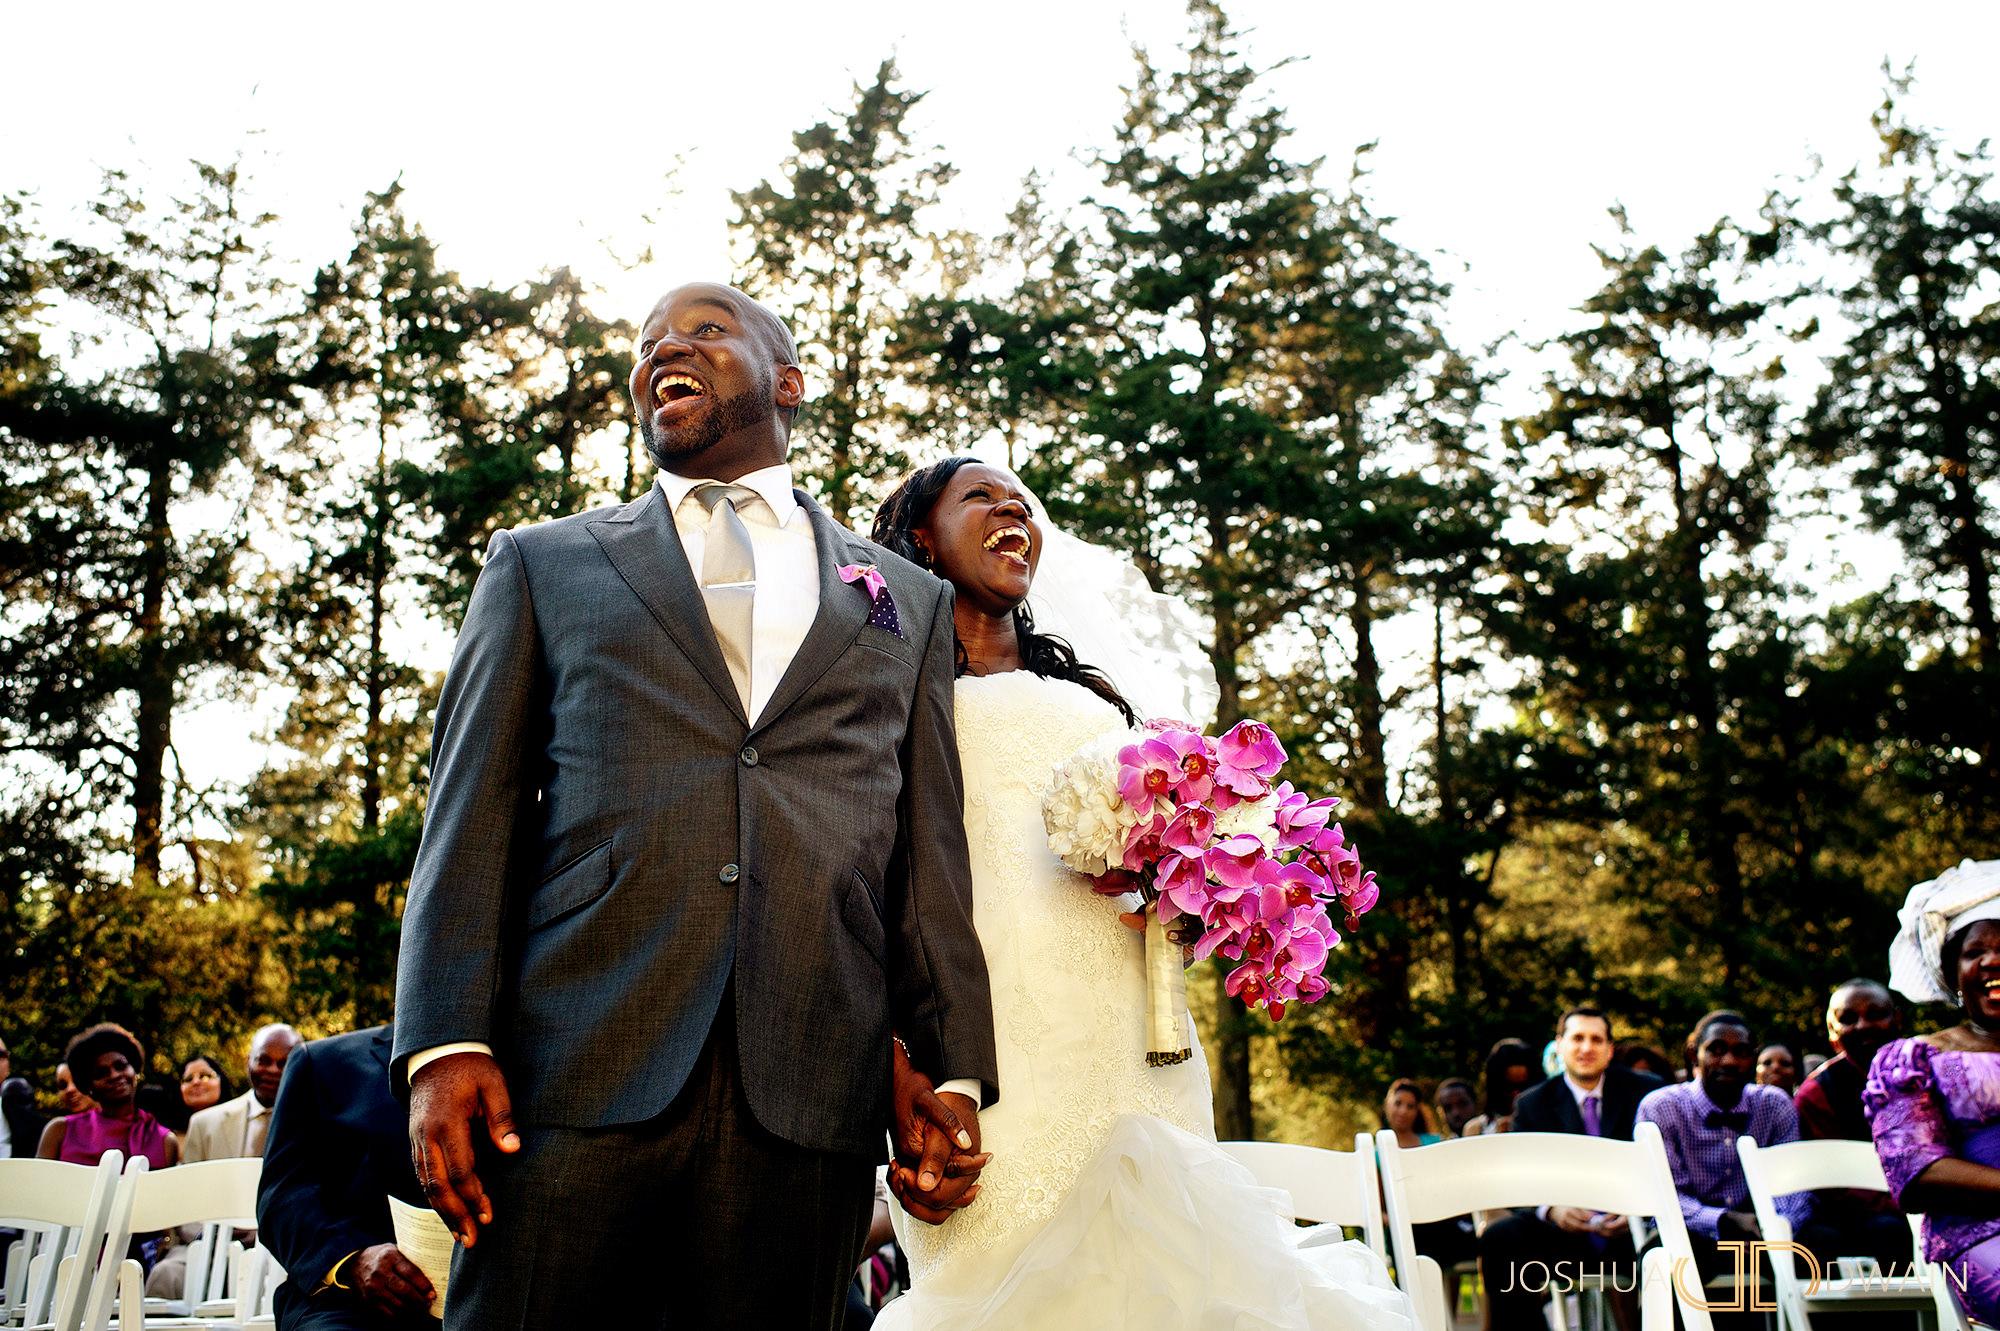 nancy-jason-009-wadsworth-estates-middletown-ct-wedding-photographer-joshua-dwain-photography-